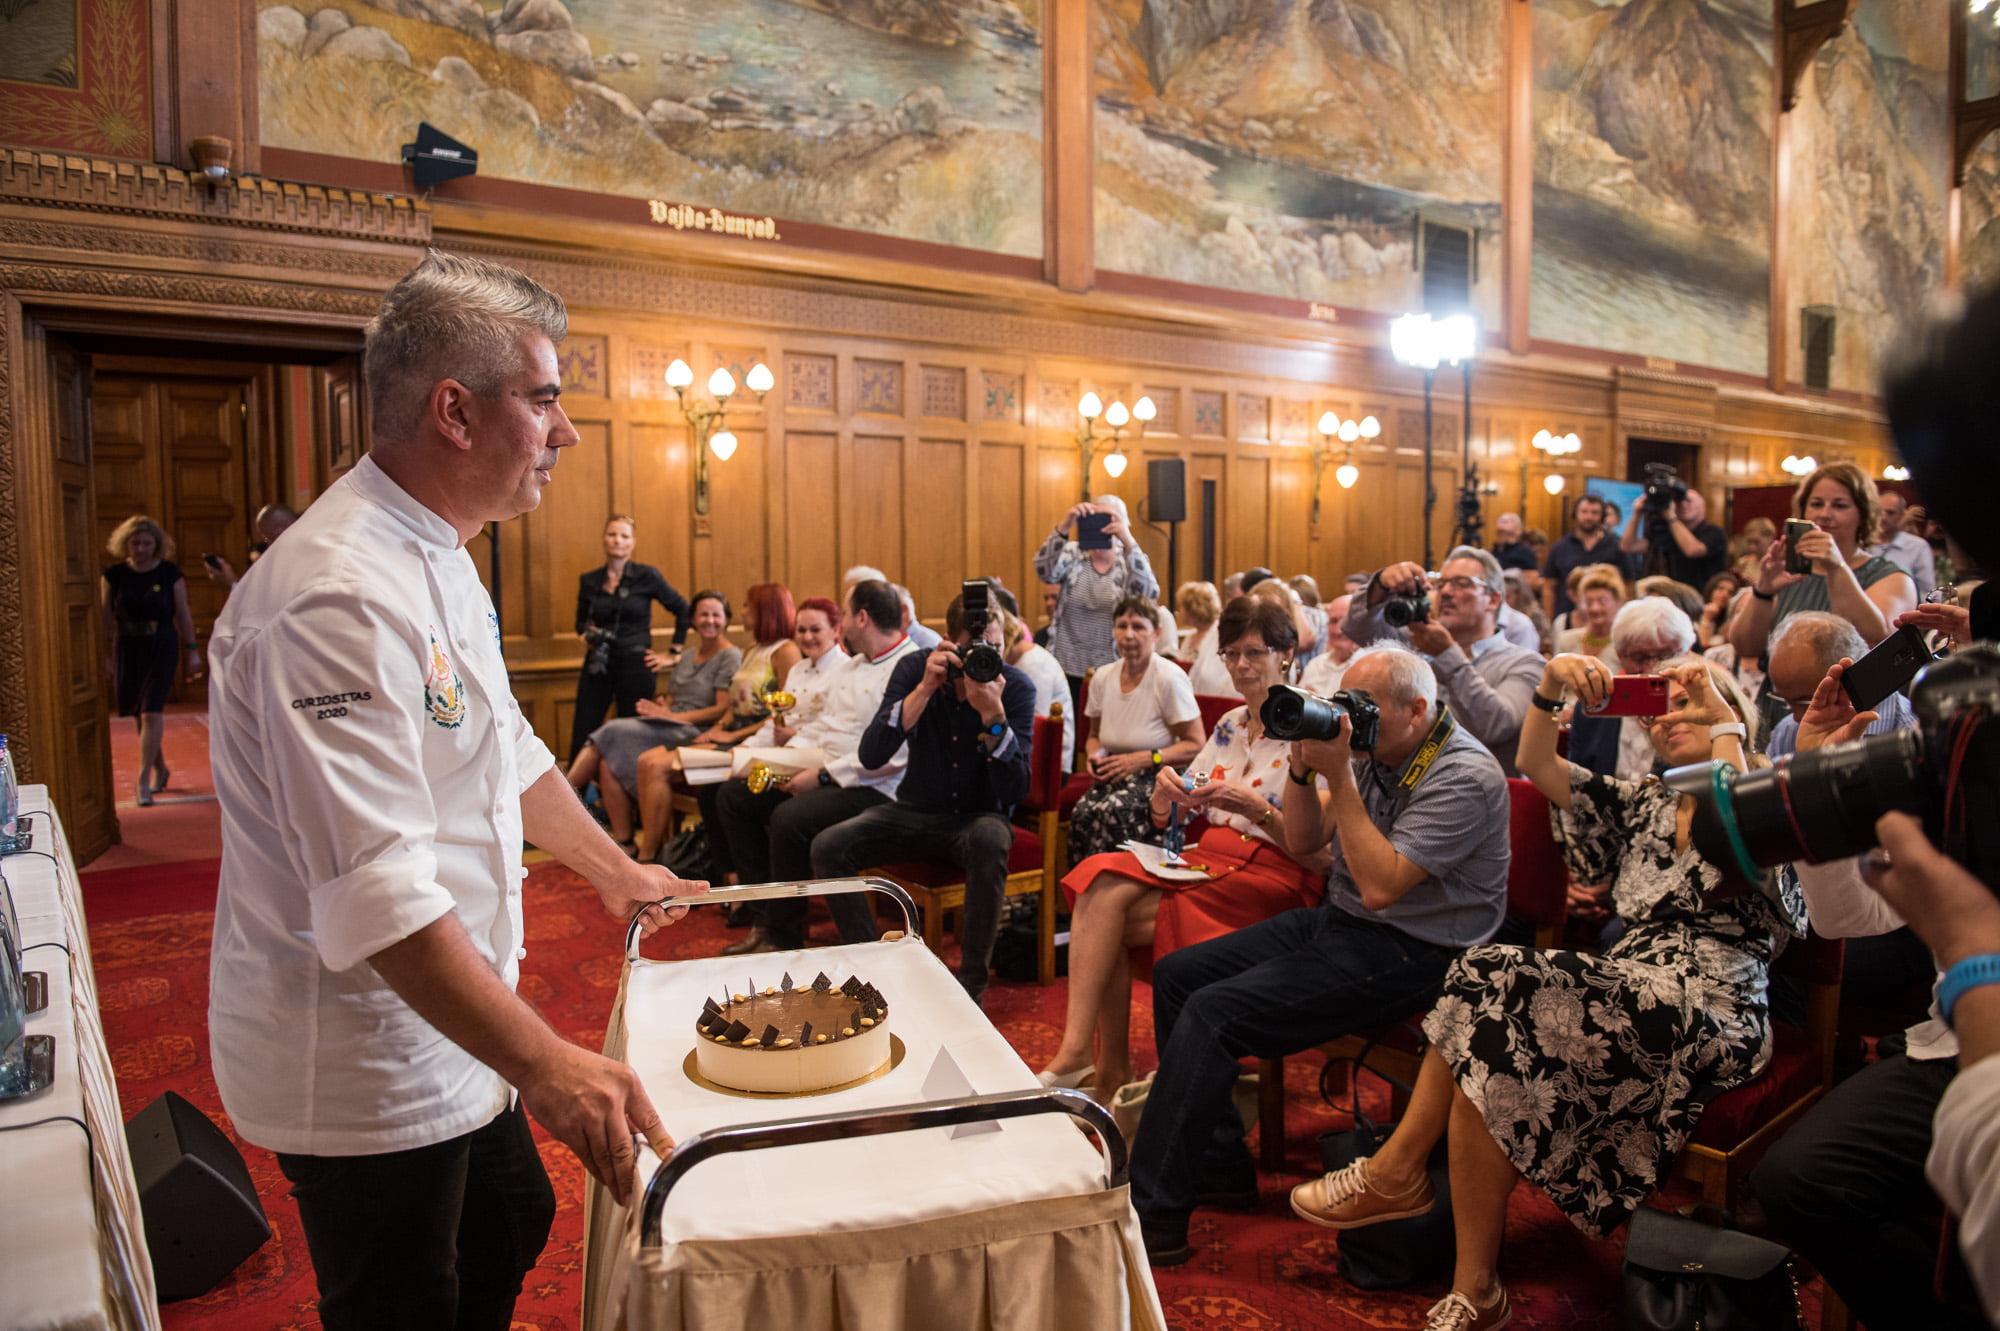 August 20, cake, Curiositas, Hungary